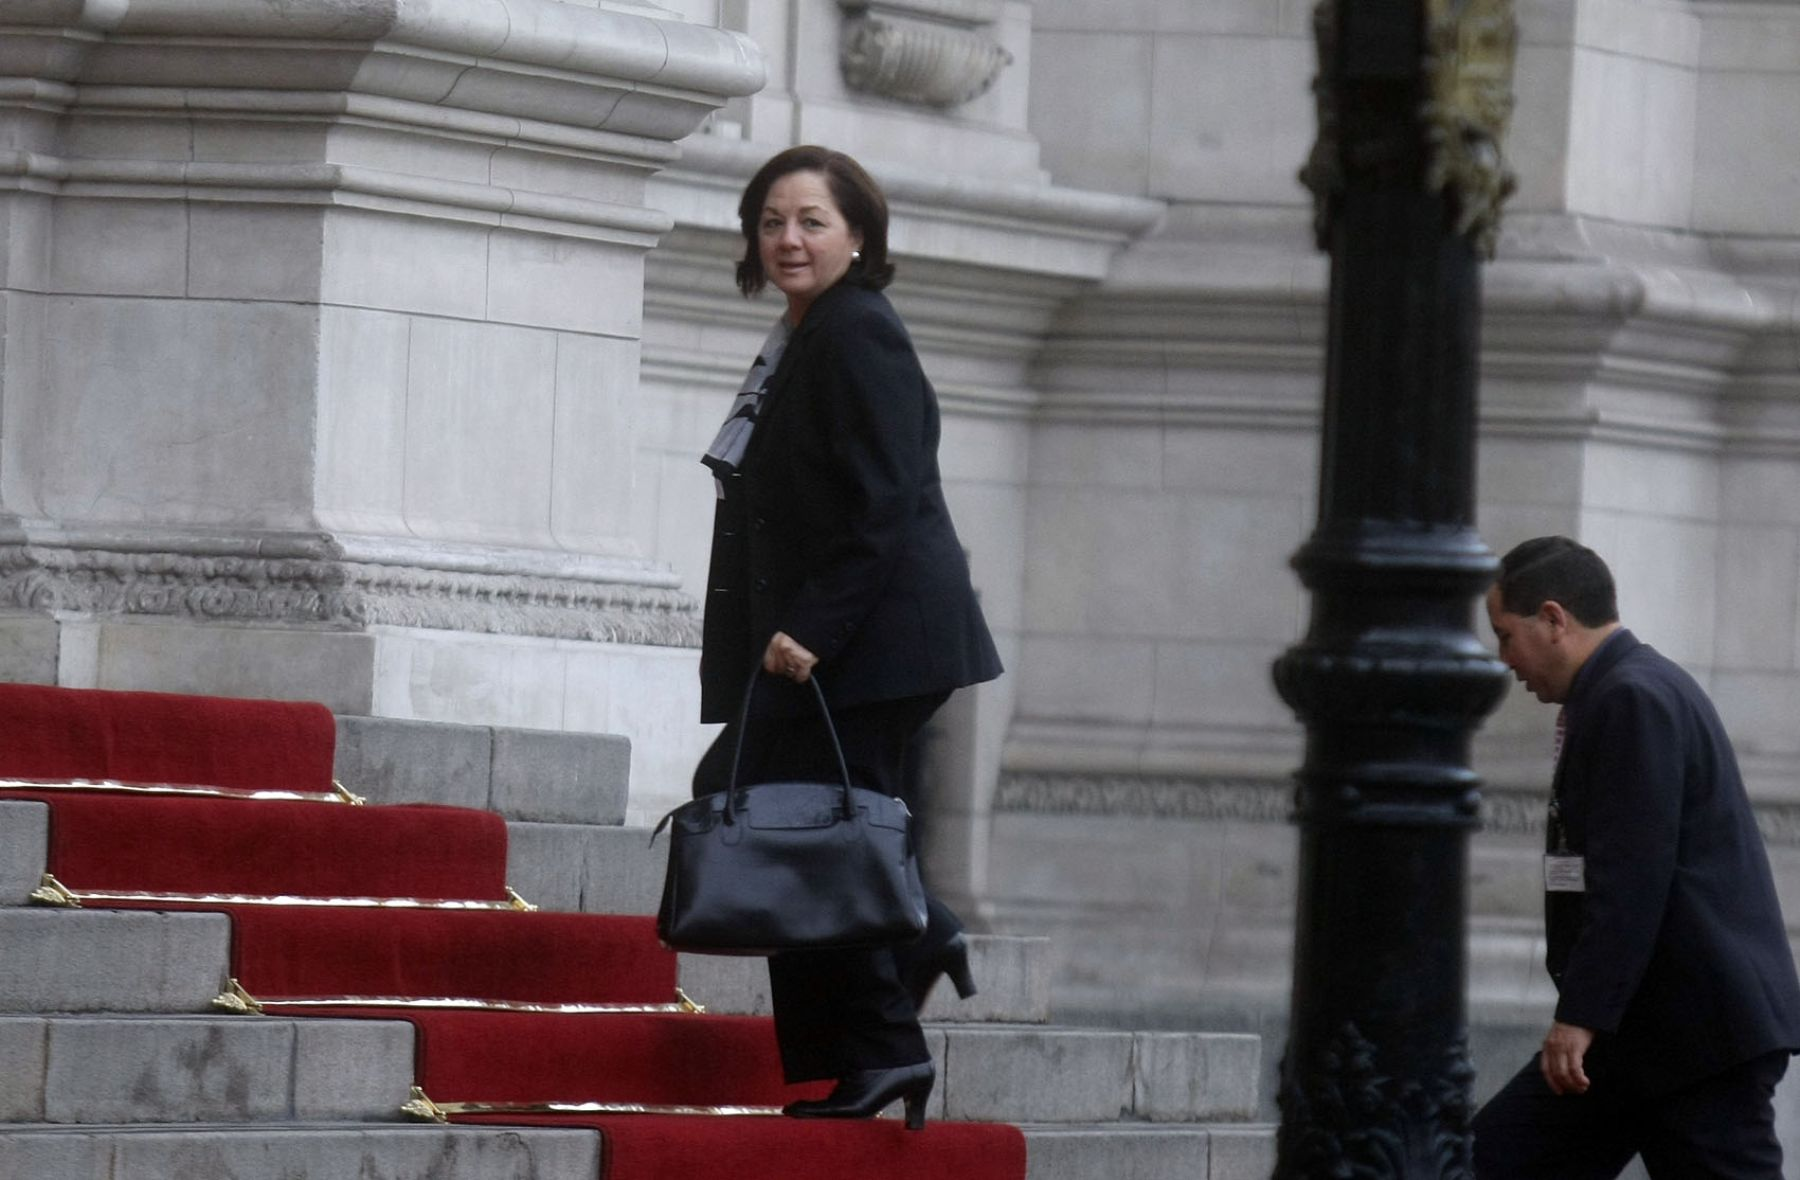 Justice Minister Rosario Fernandez. Photo: ANDINA/Juan Carlos Guzman Negrini